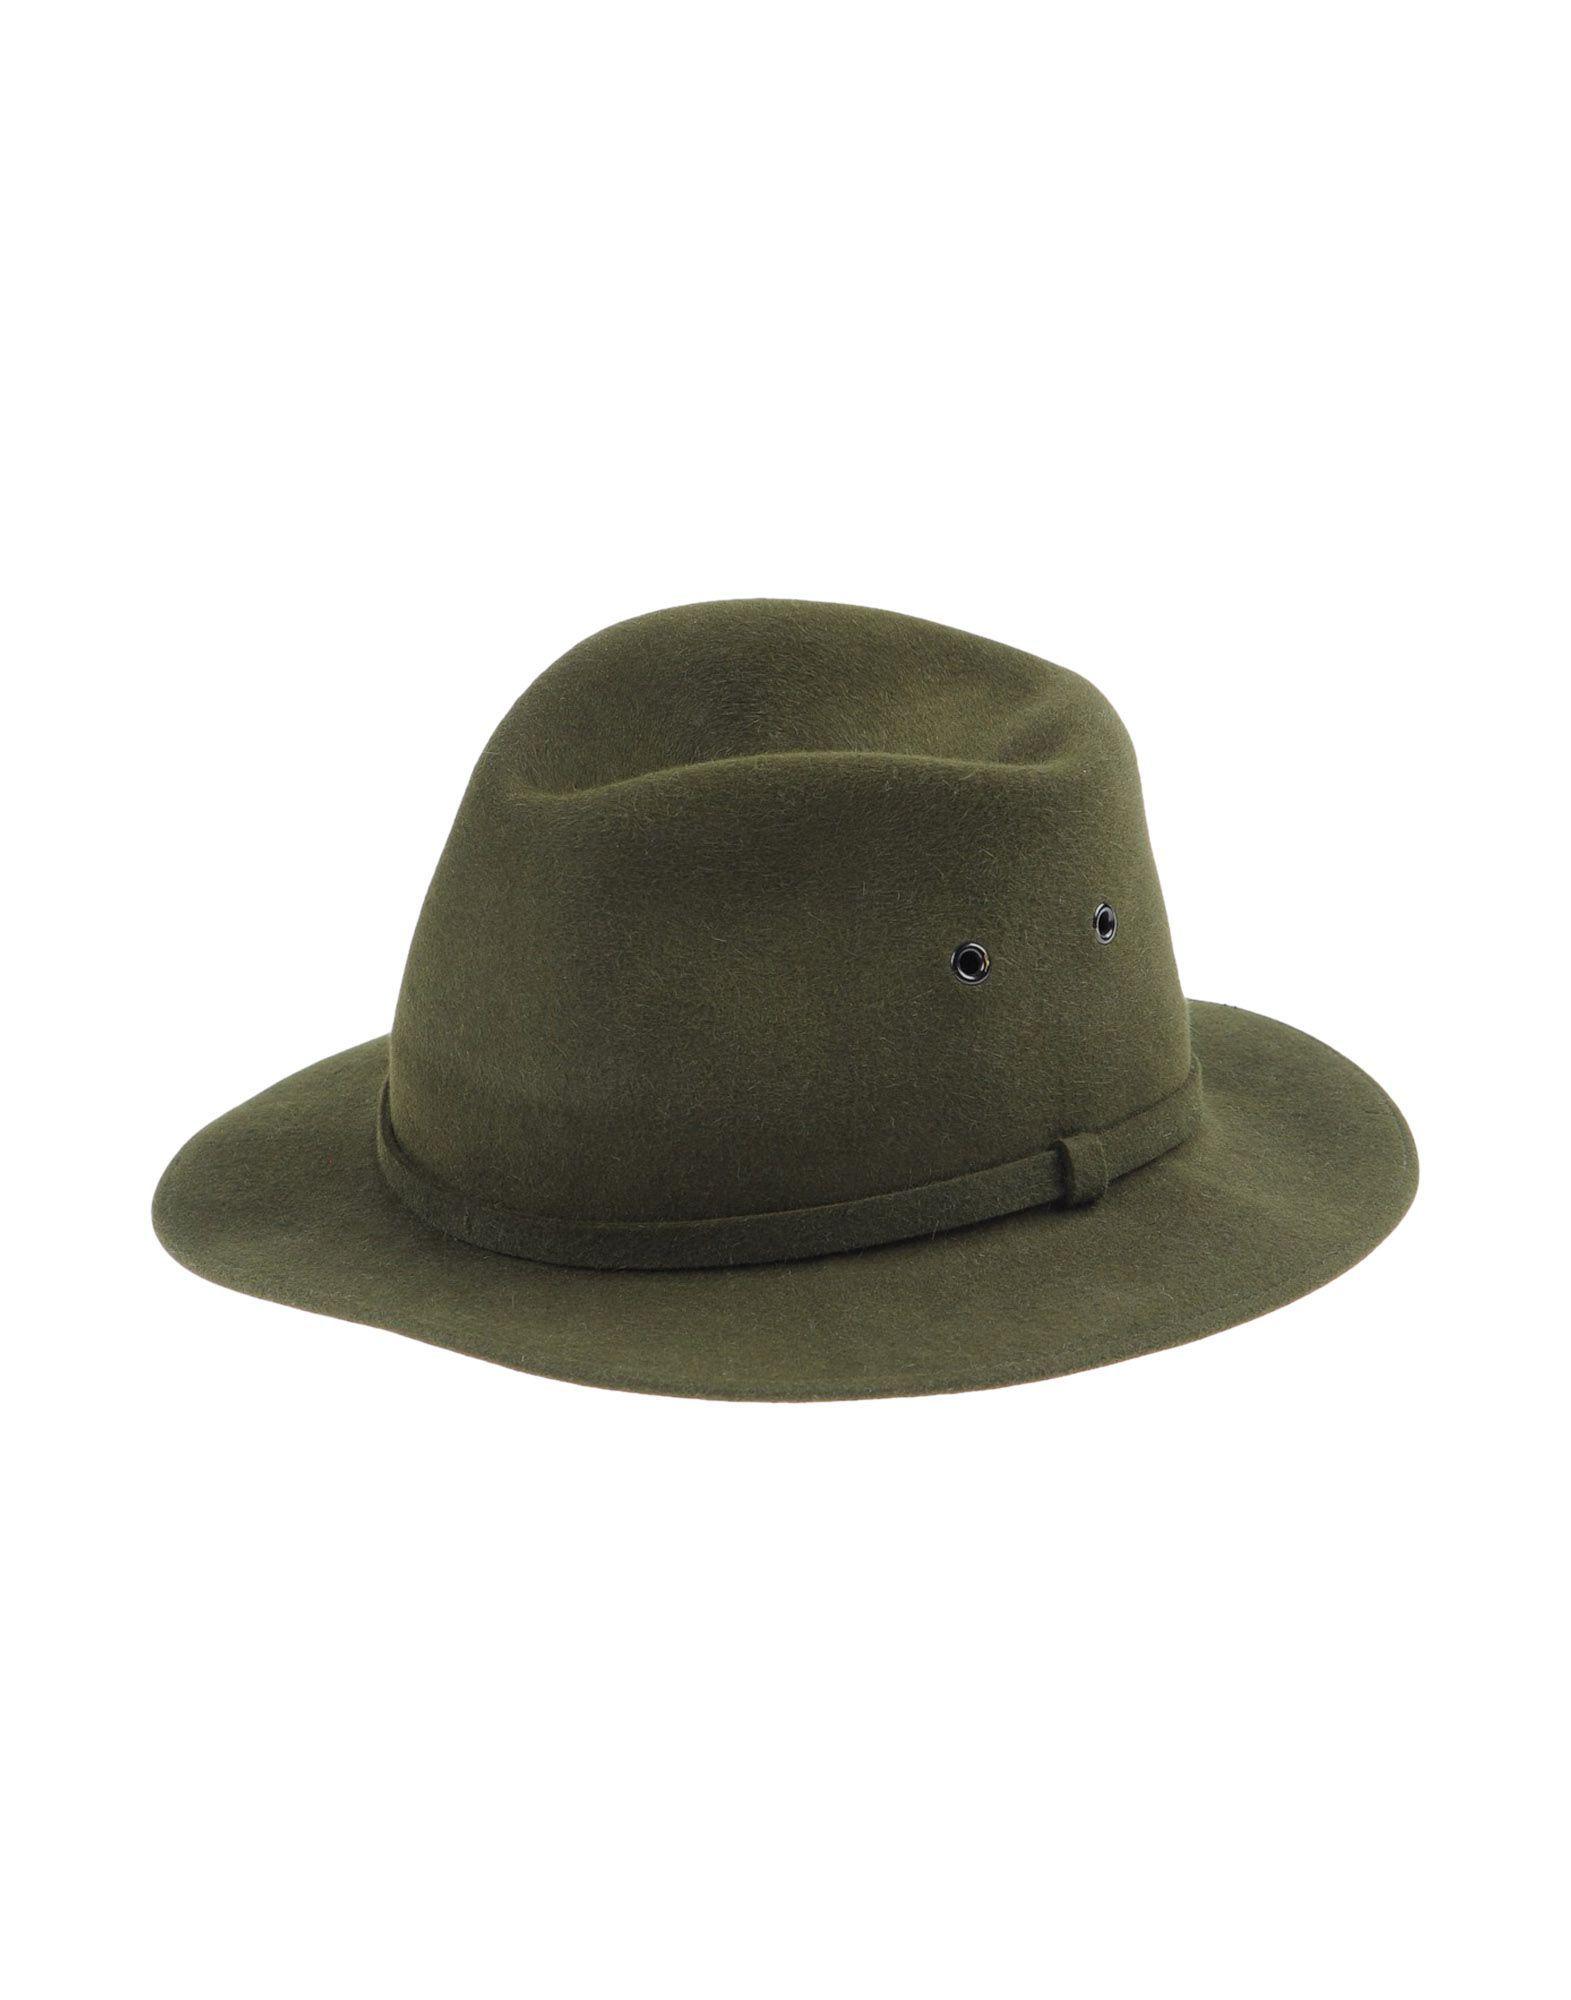 Barbisio Hat - Women Barbisio Hats online on YOOX United Kingdom - 46437220 b492b6562c4